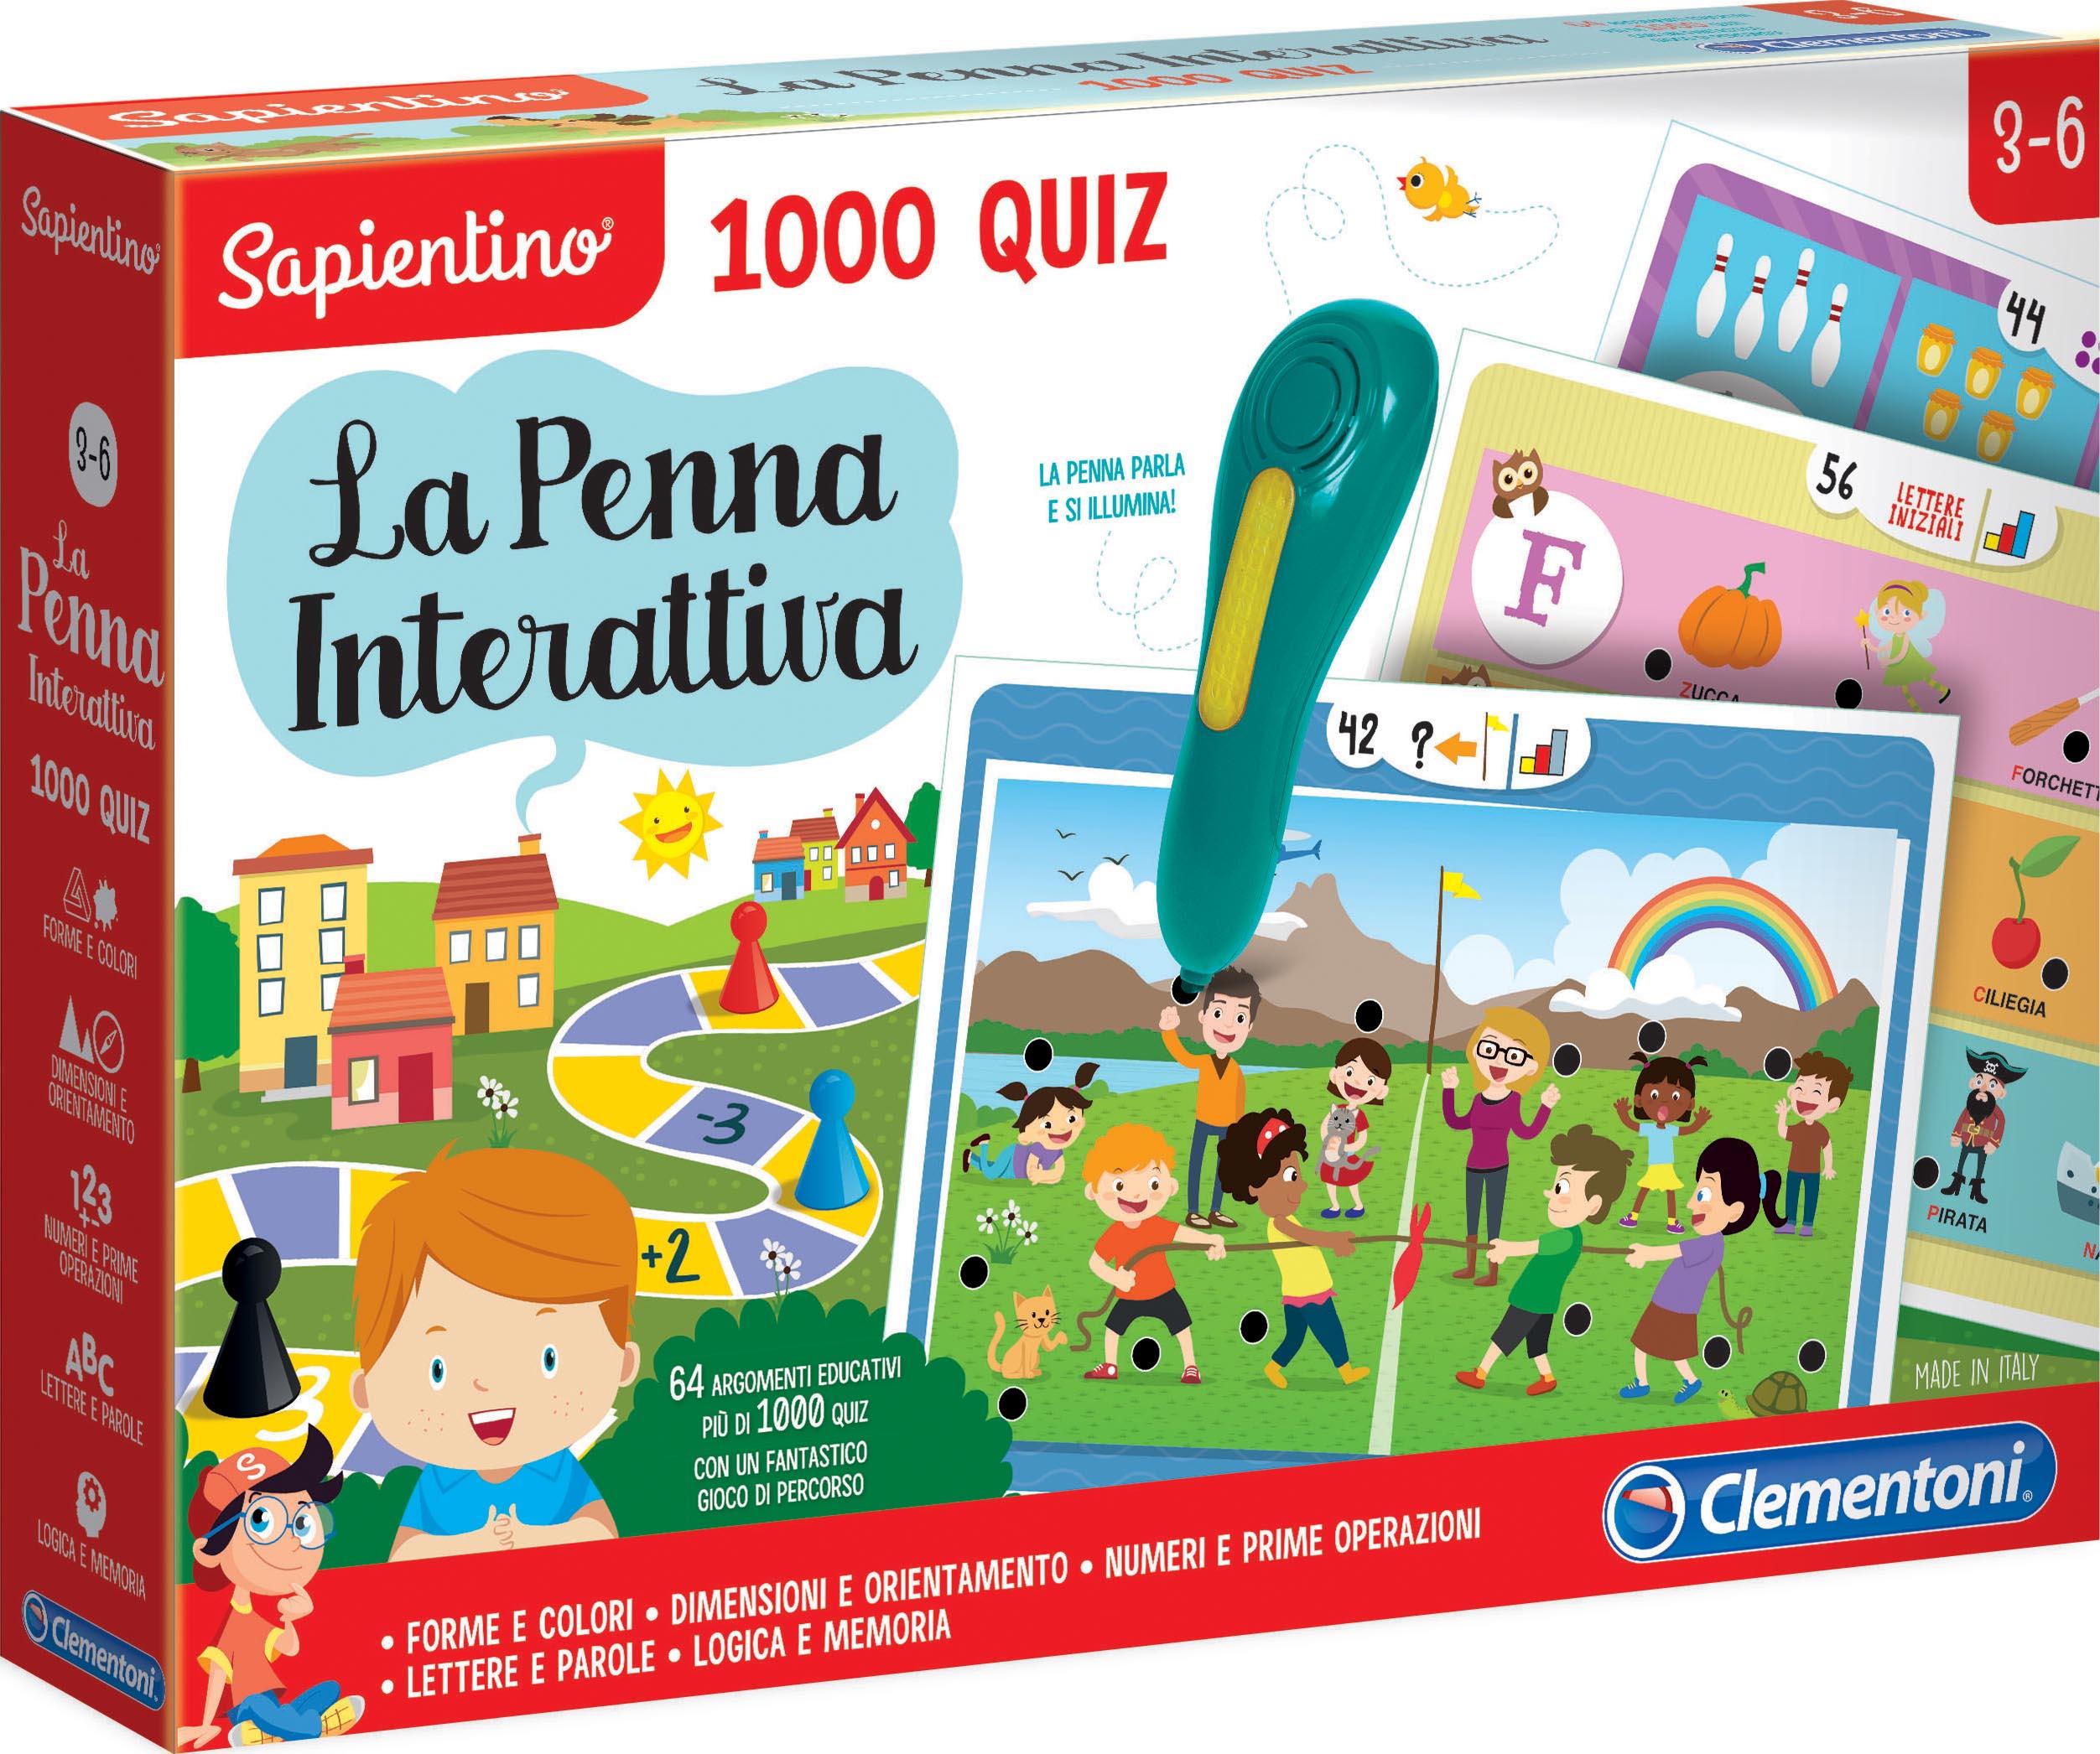 PENNA INTERATTIVA 1000 QUIZ